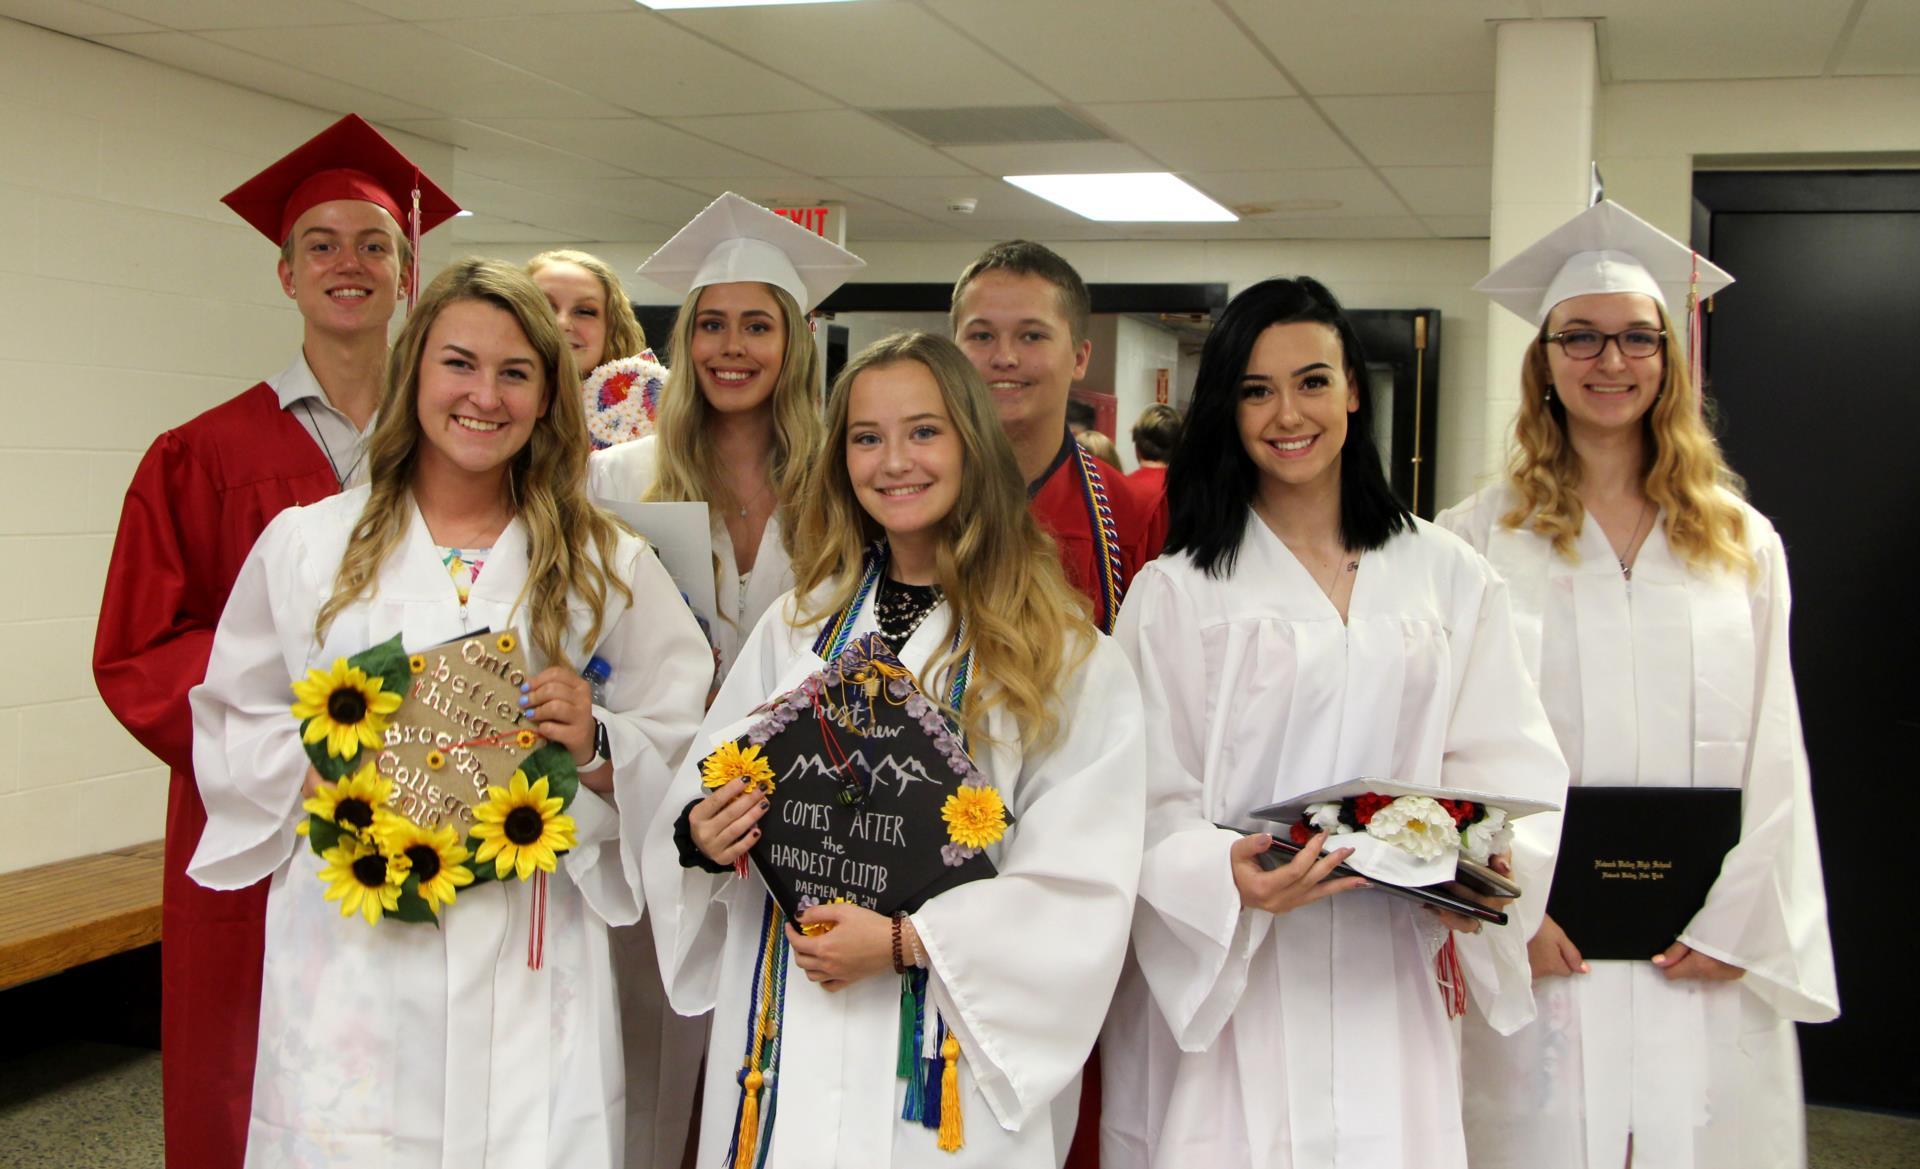 Eight graduates